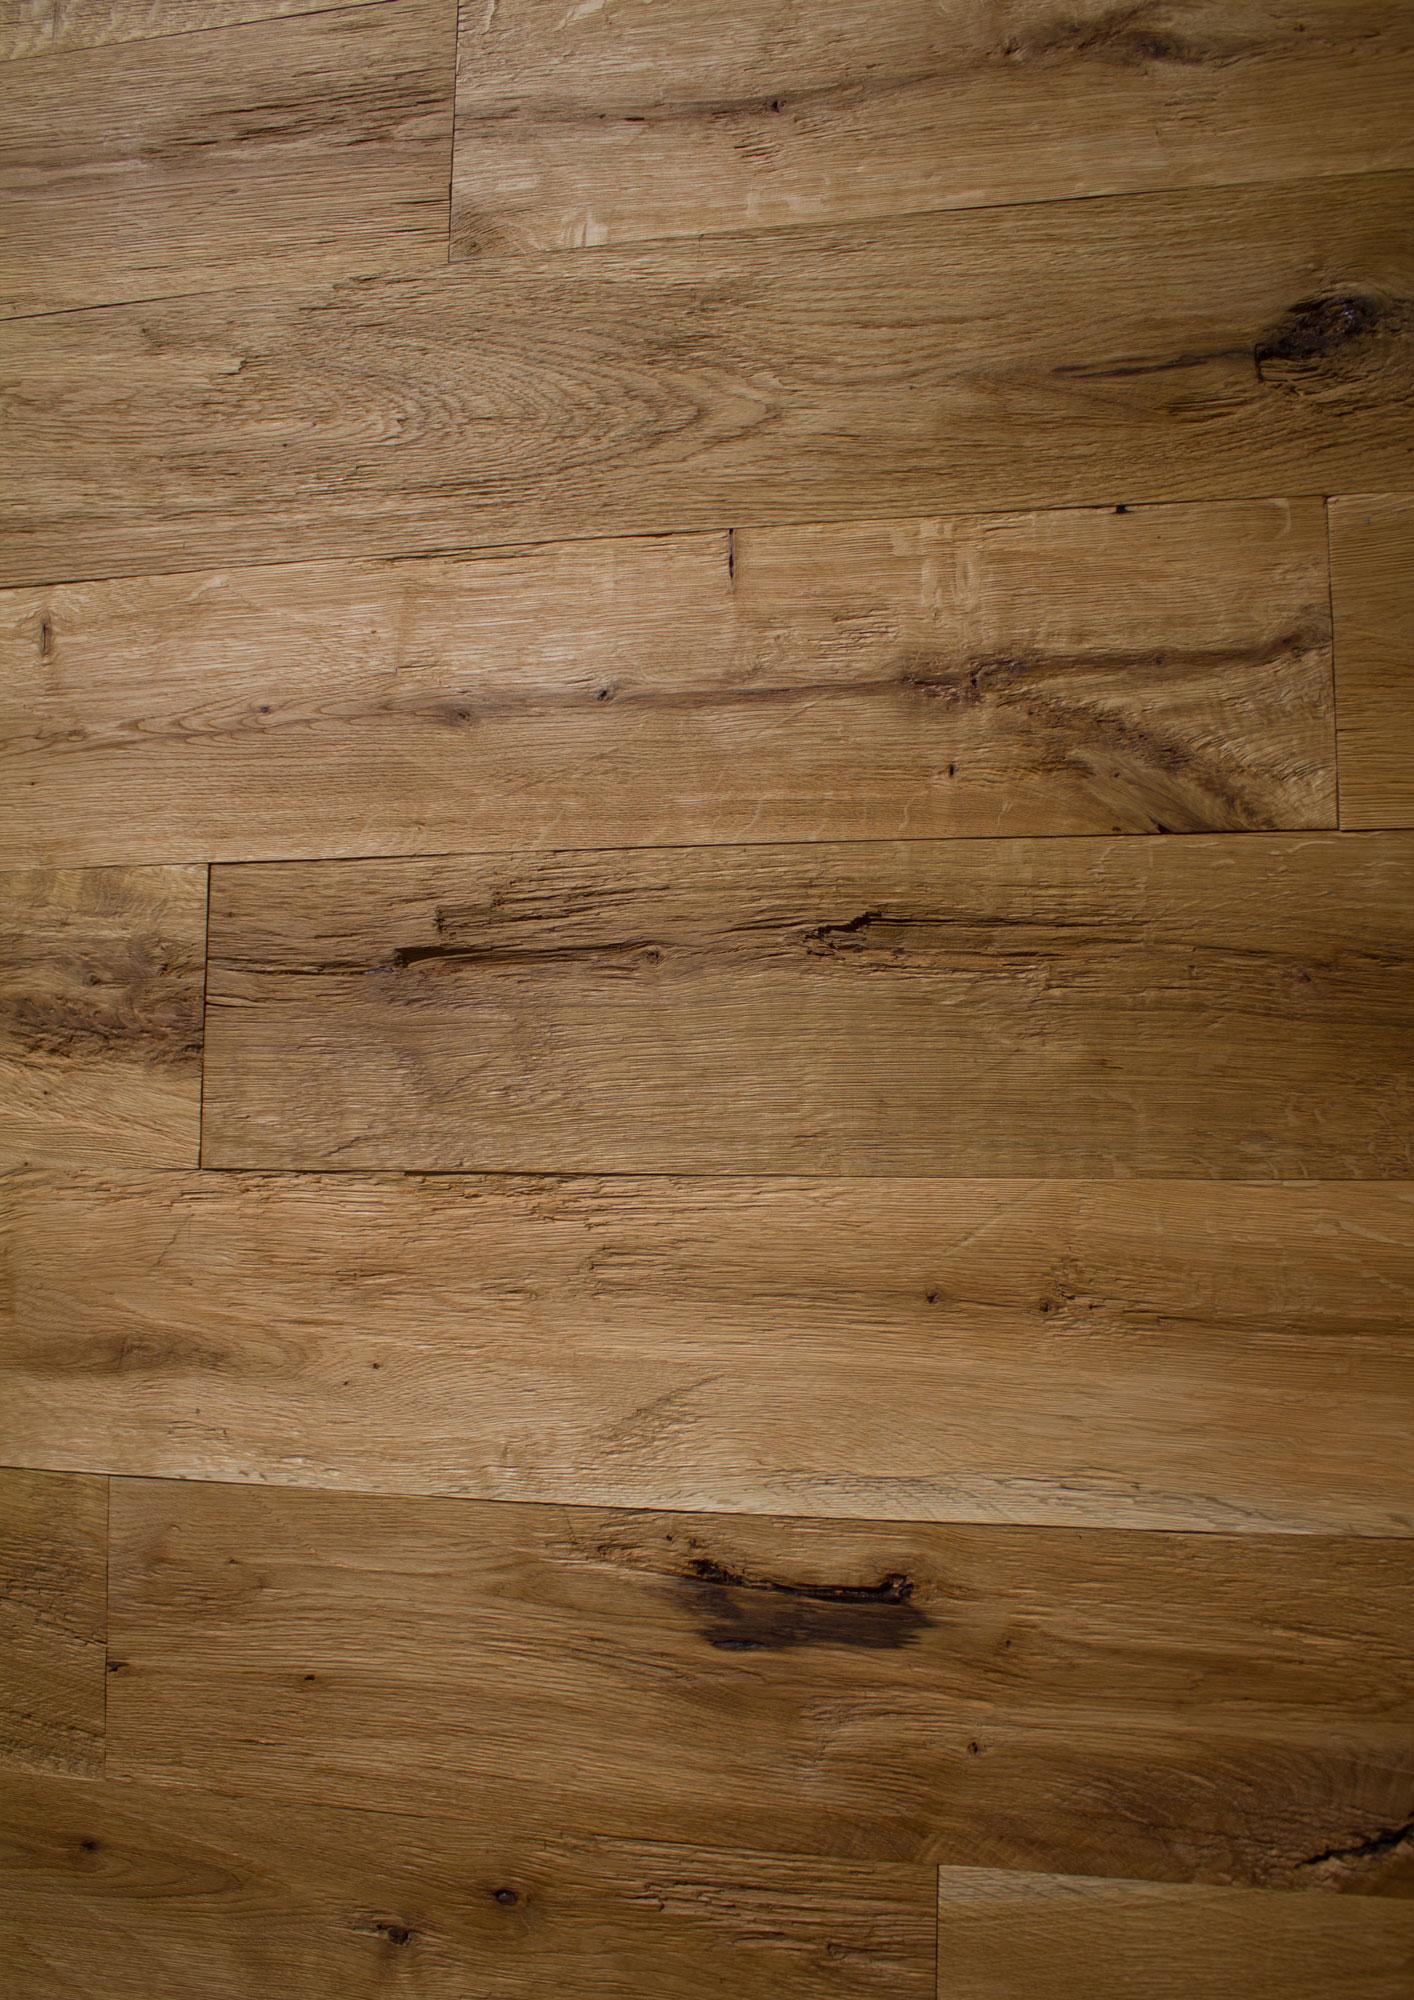 19xx146x2000//4000 mm Vintage Holz-Wandverkleidung Tiroler Zirbe gehackt roh